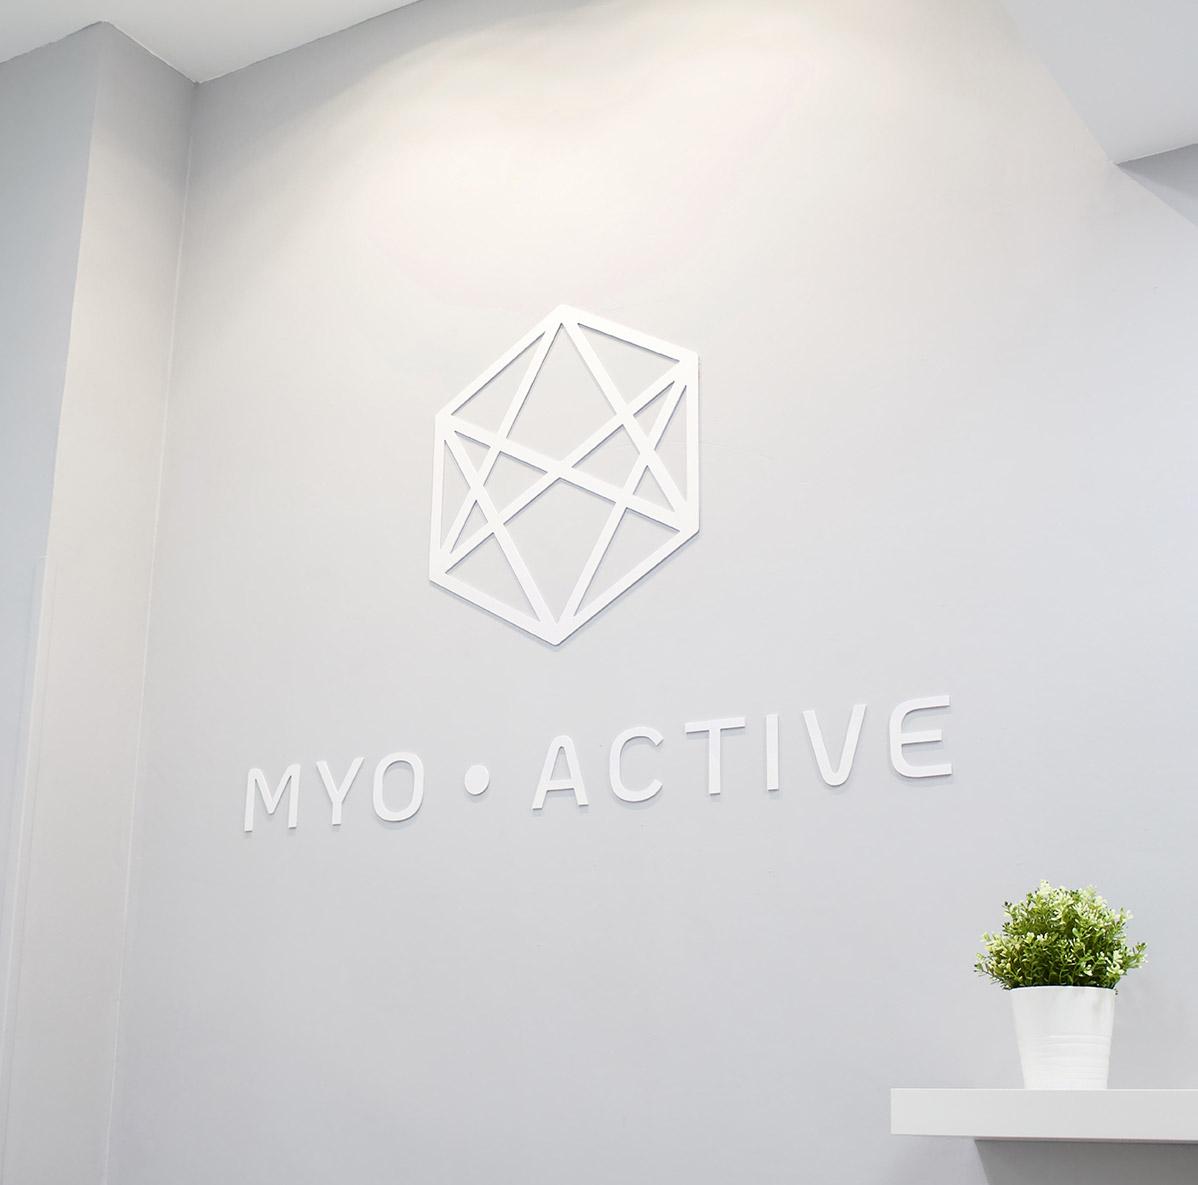 aplicacion-logo-myo-active